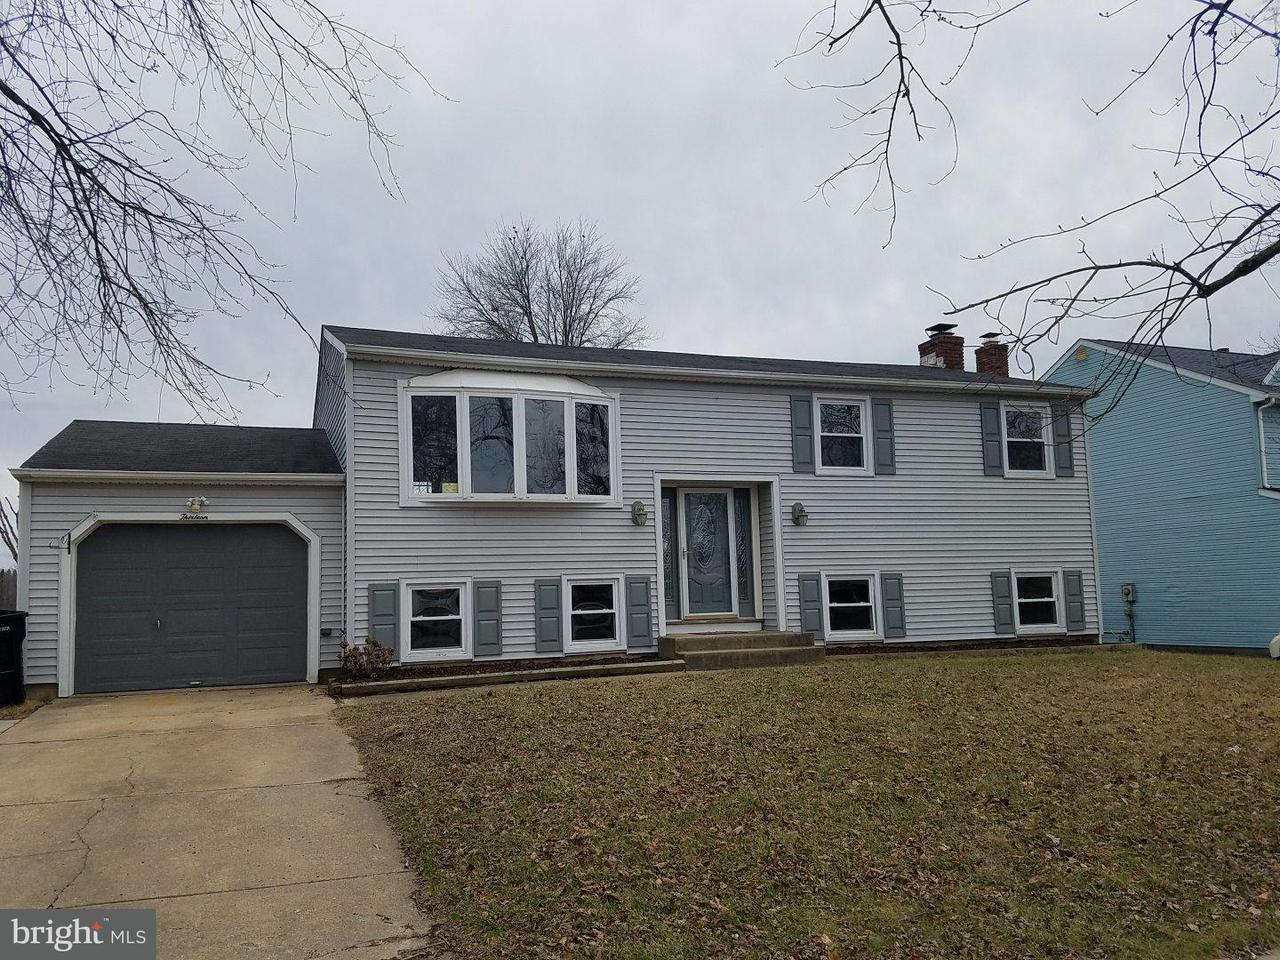 独户住宅 为 销售 在 13 CONSTITUTION Road Clementon, 新泽西州 08021 美国